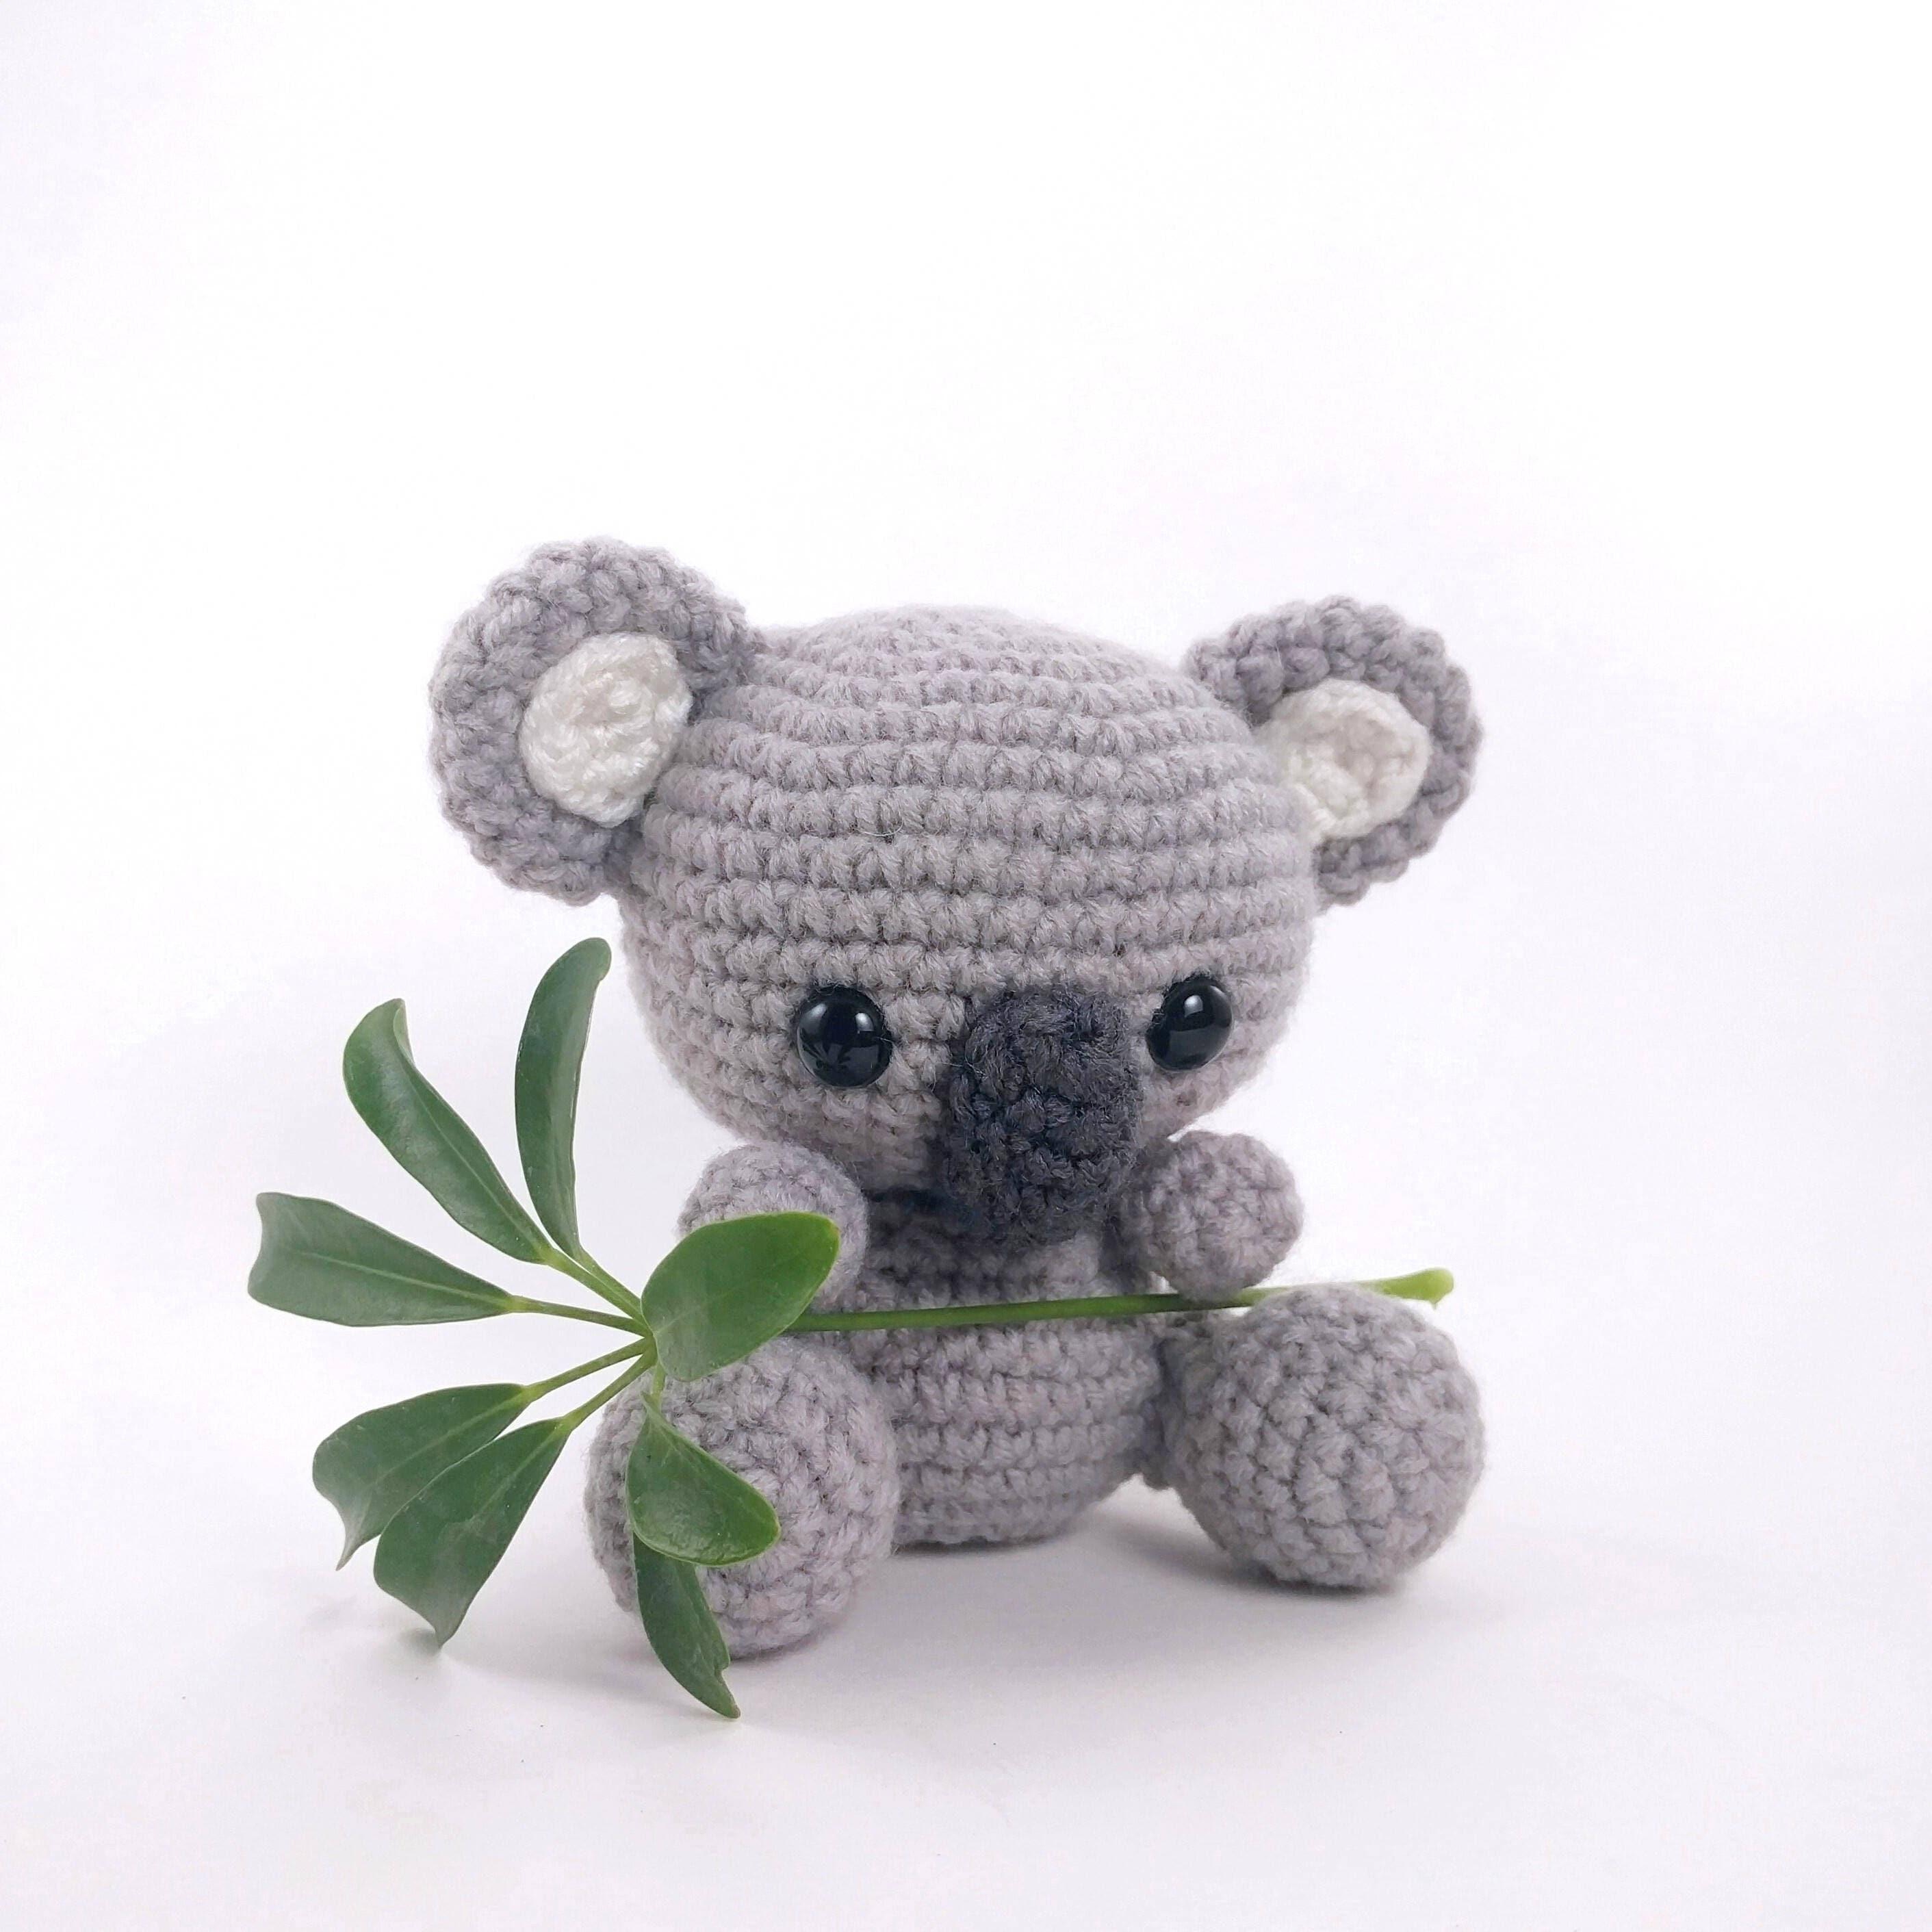 PATTERN: Kimba the Koala Crochet koala pattern amigurumi | Etsy